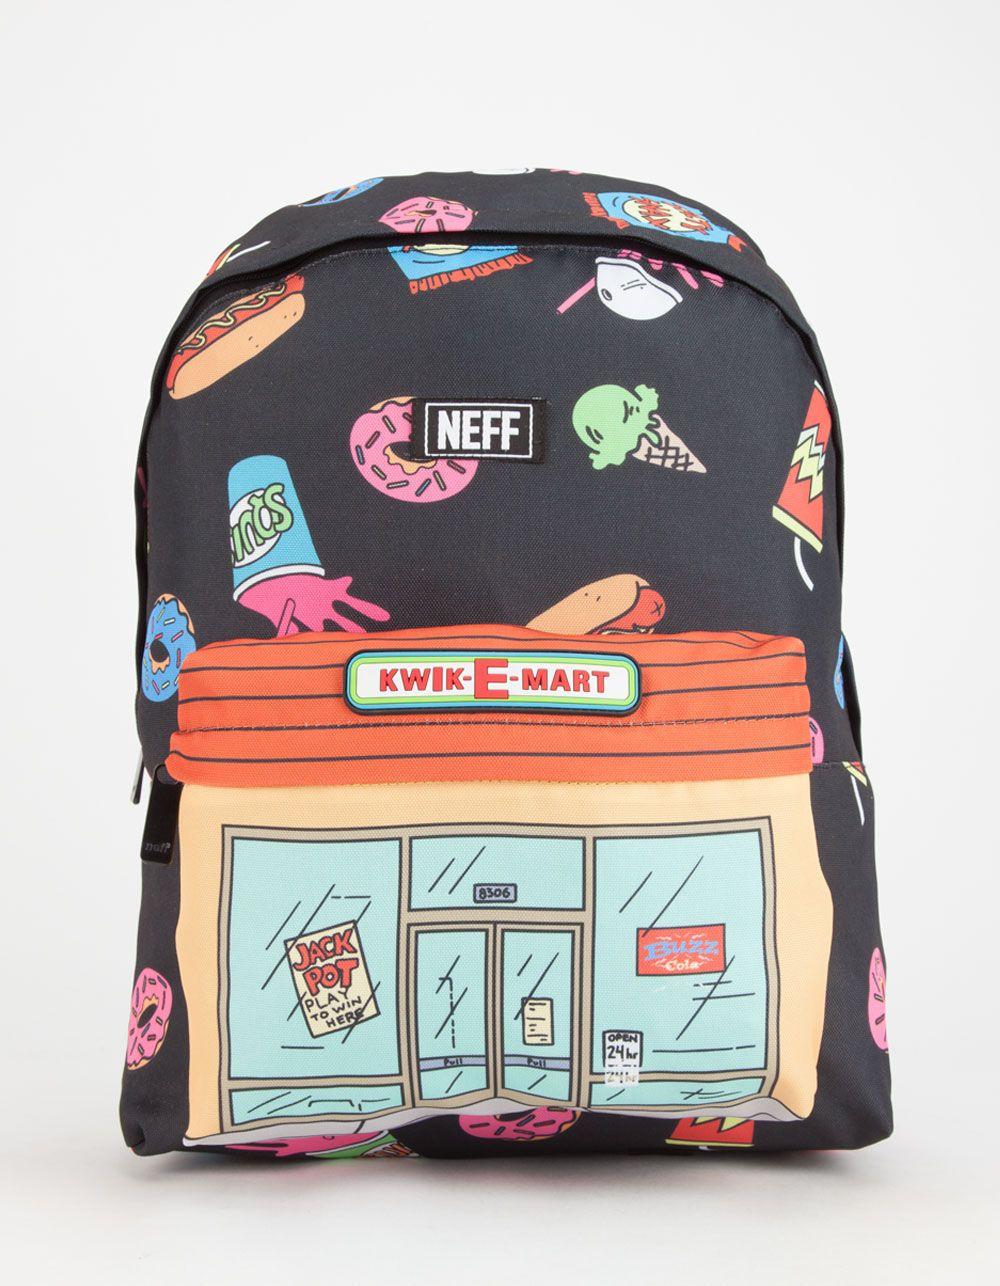 b26ebfb16585 NEFF x The Simpsons Kwik-E-Mart Backpack